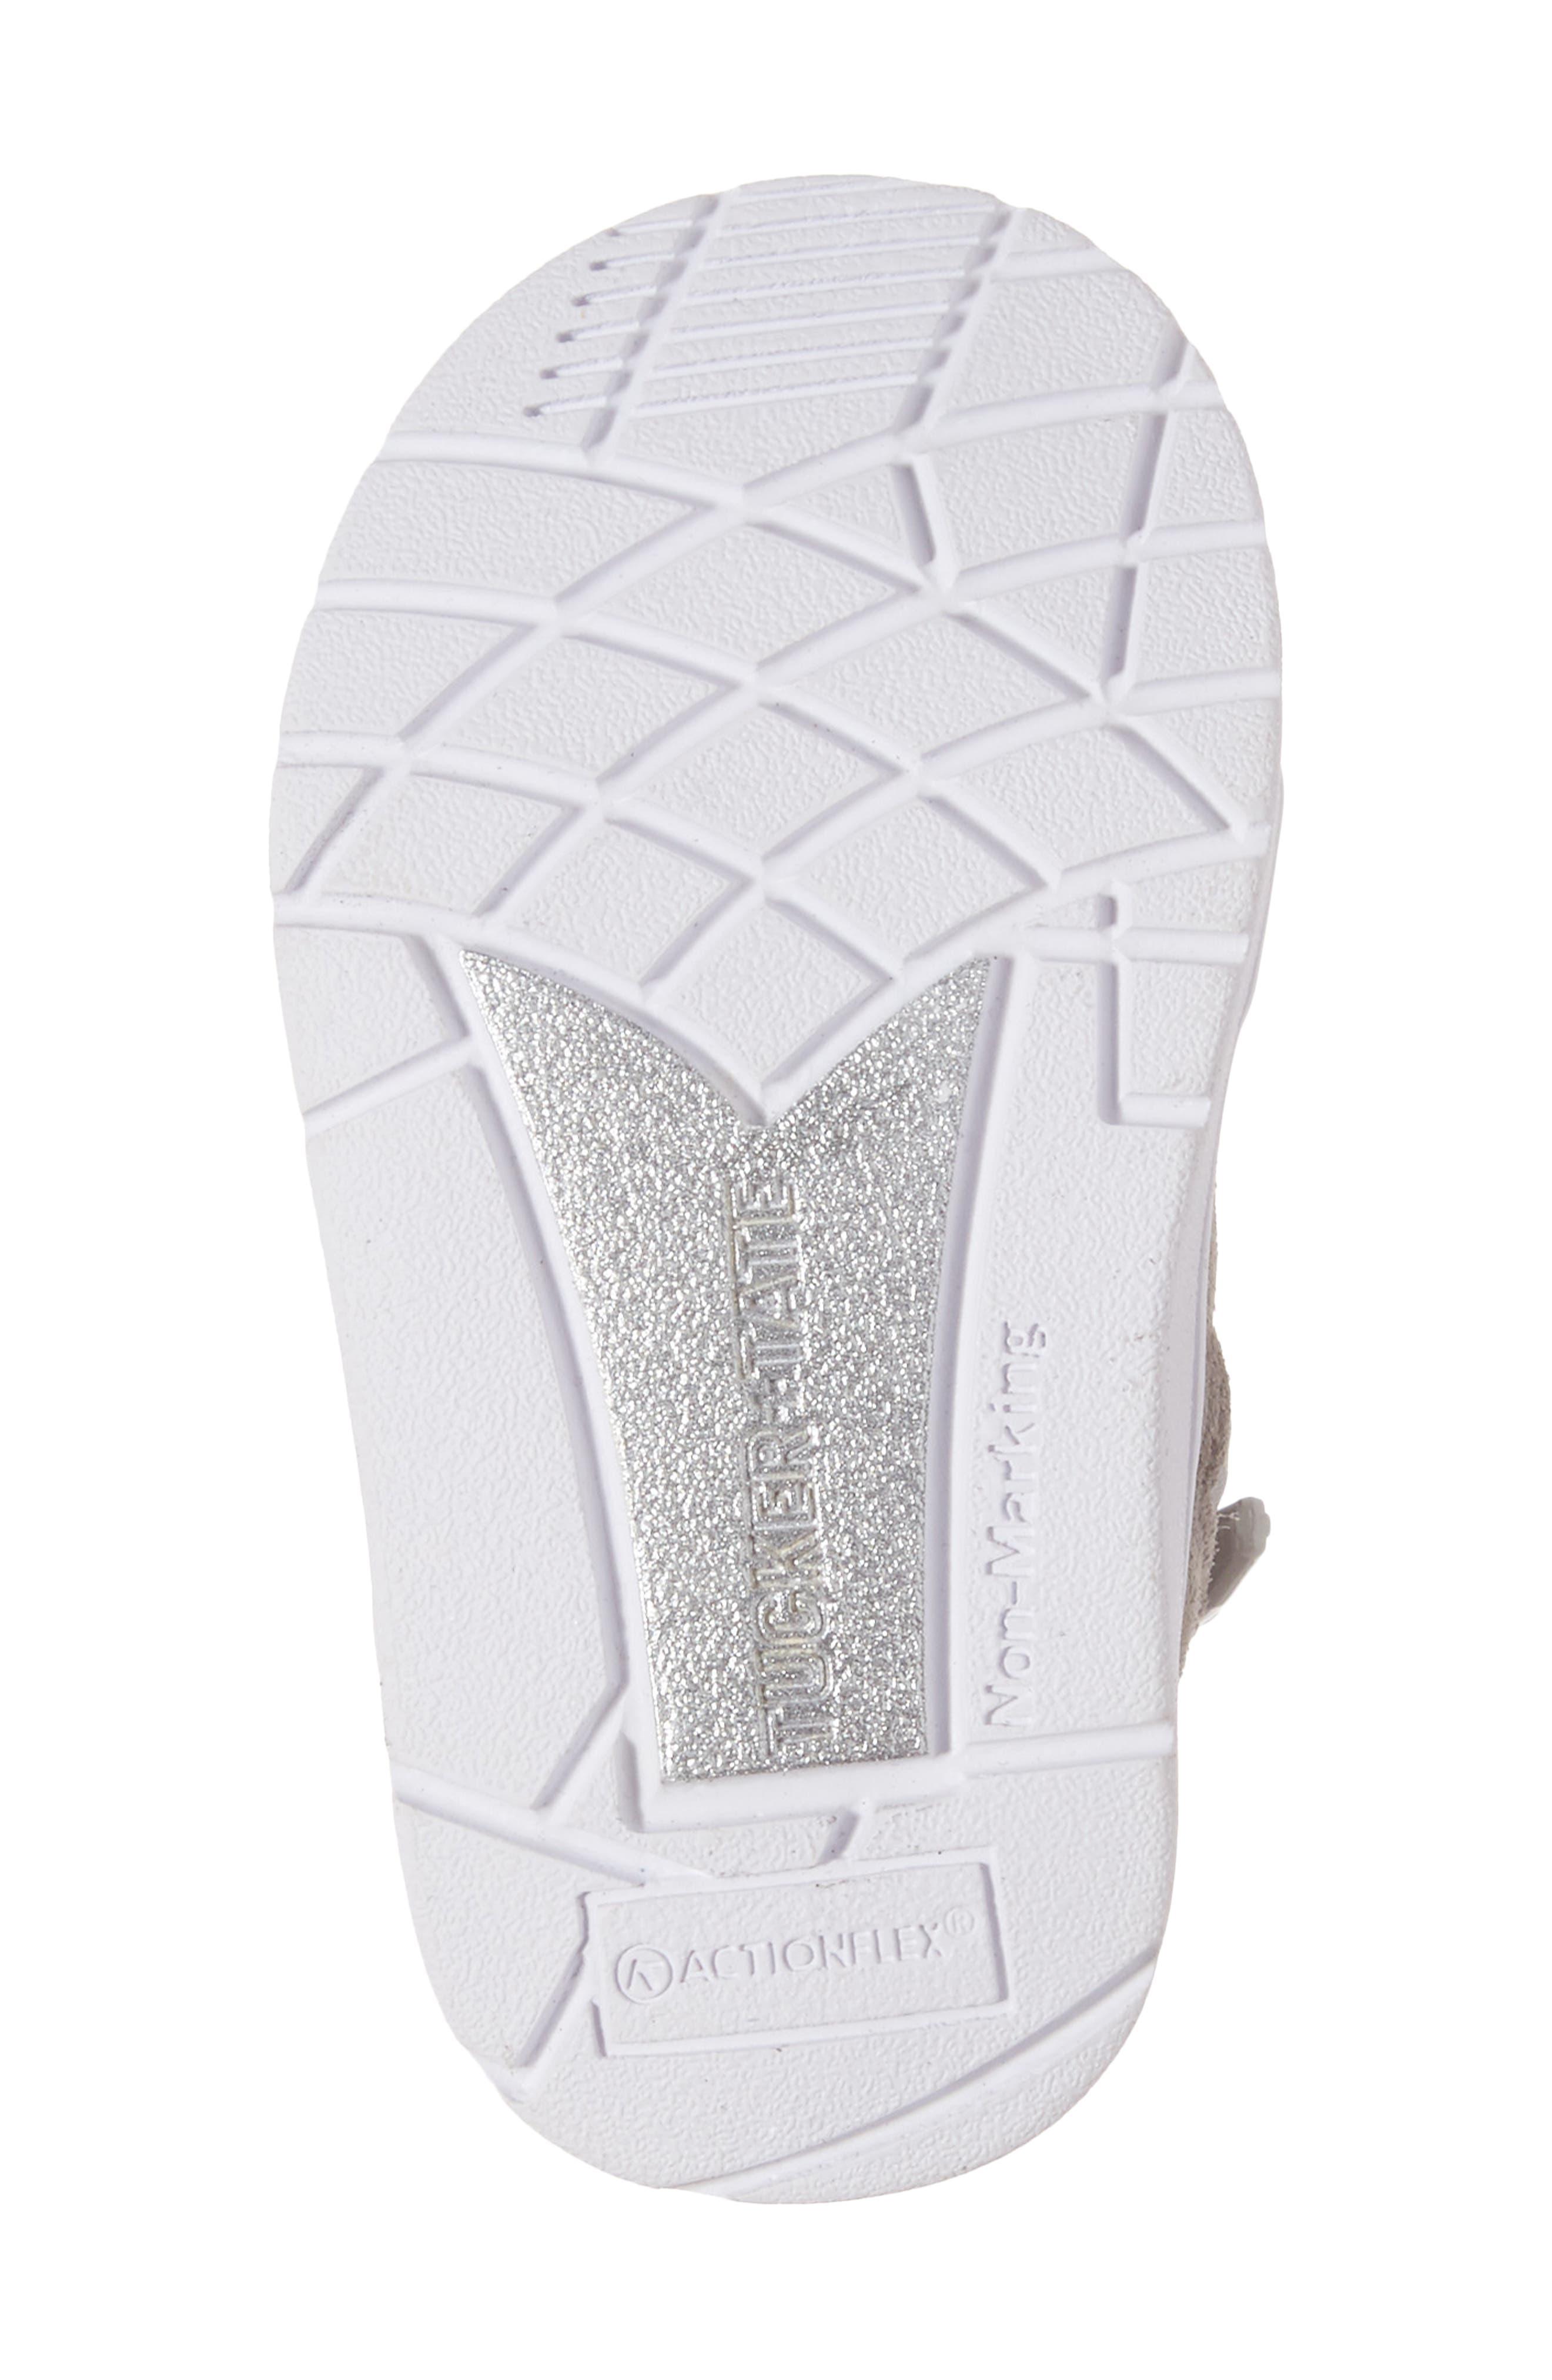 Diantha Star Appliqué High Top Sneaker,                             Alternate thumbnail 6, color,                             020